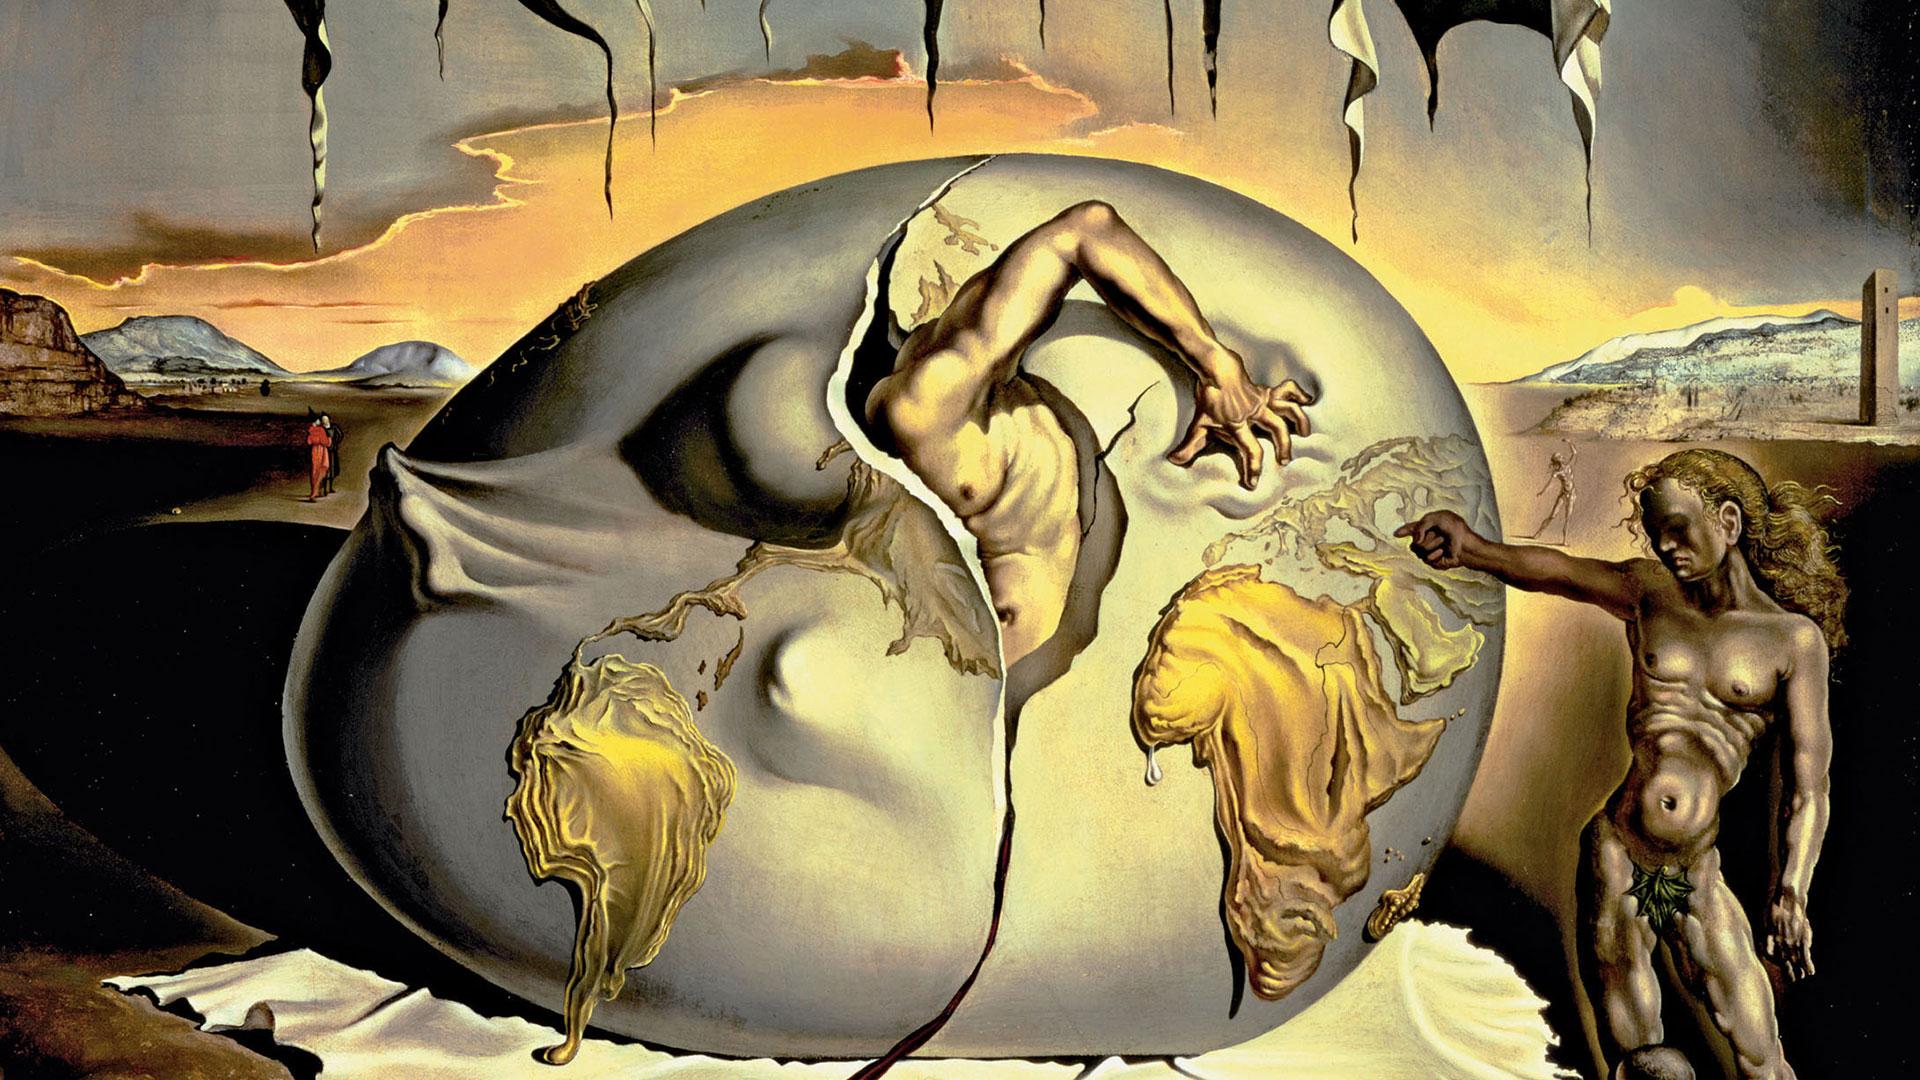 Dalí hero asset